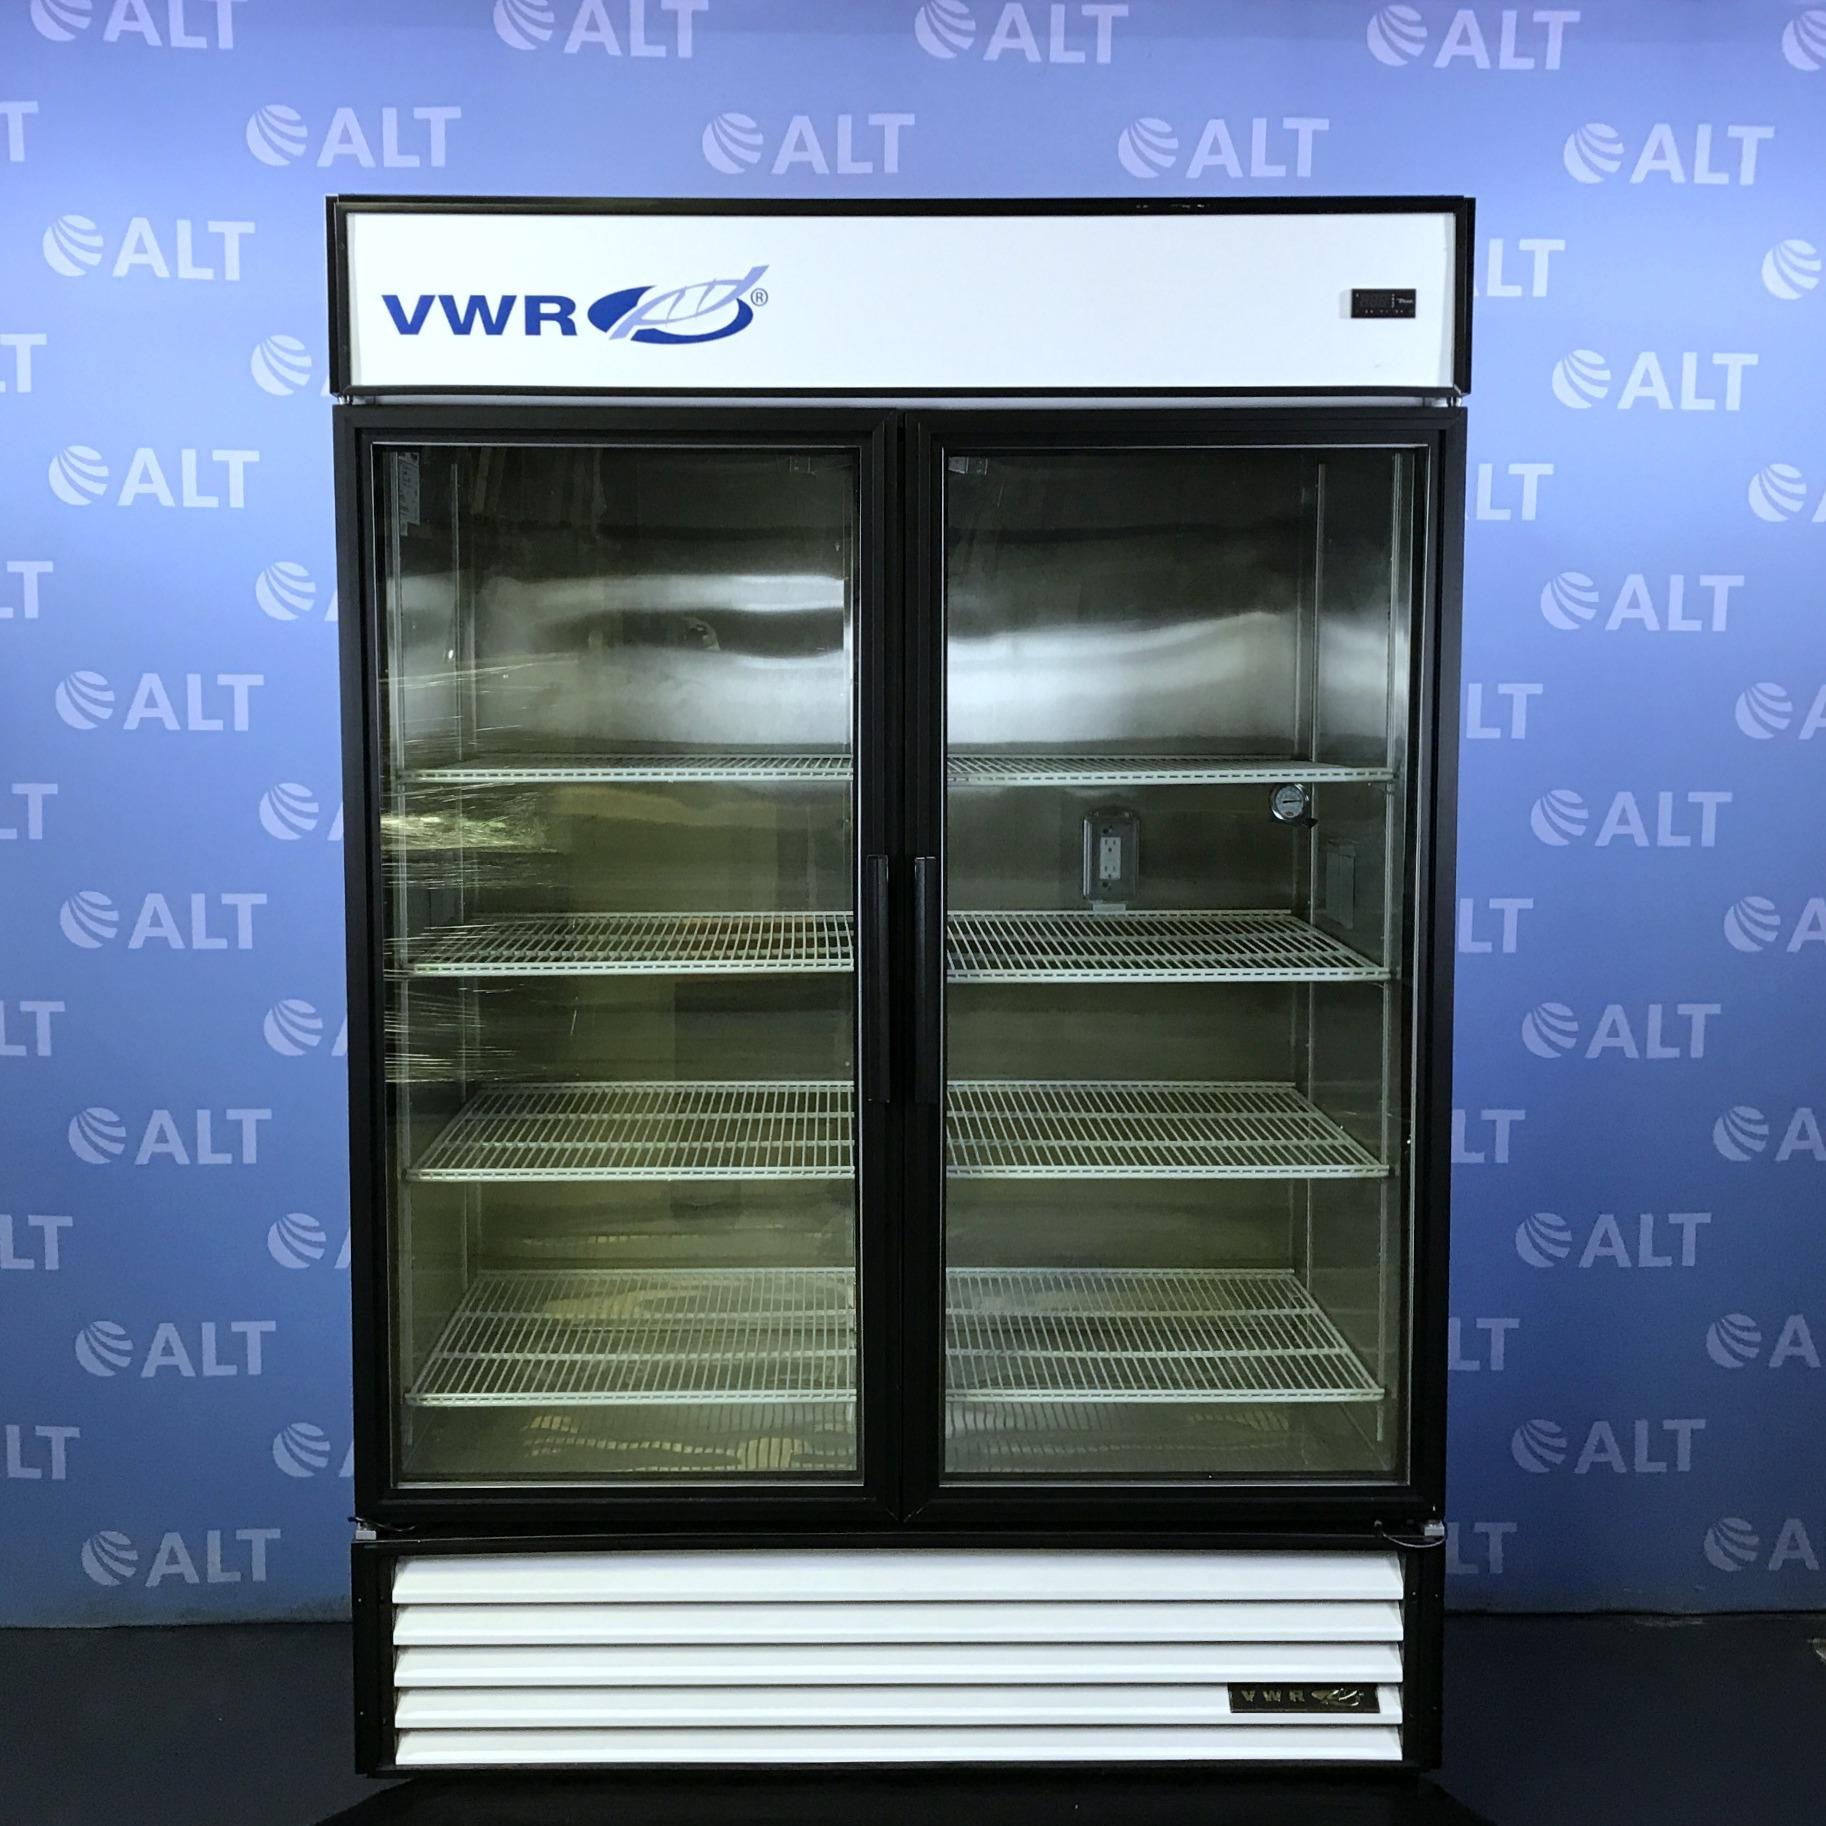 VWR Chromatography Two Door Refrigerator Cat No. 10018-862 Image